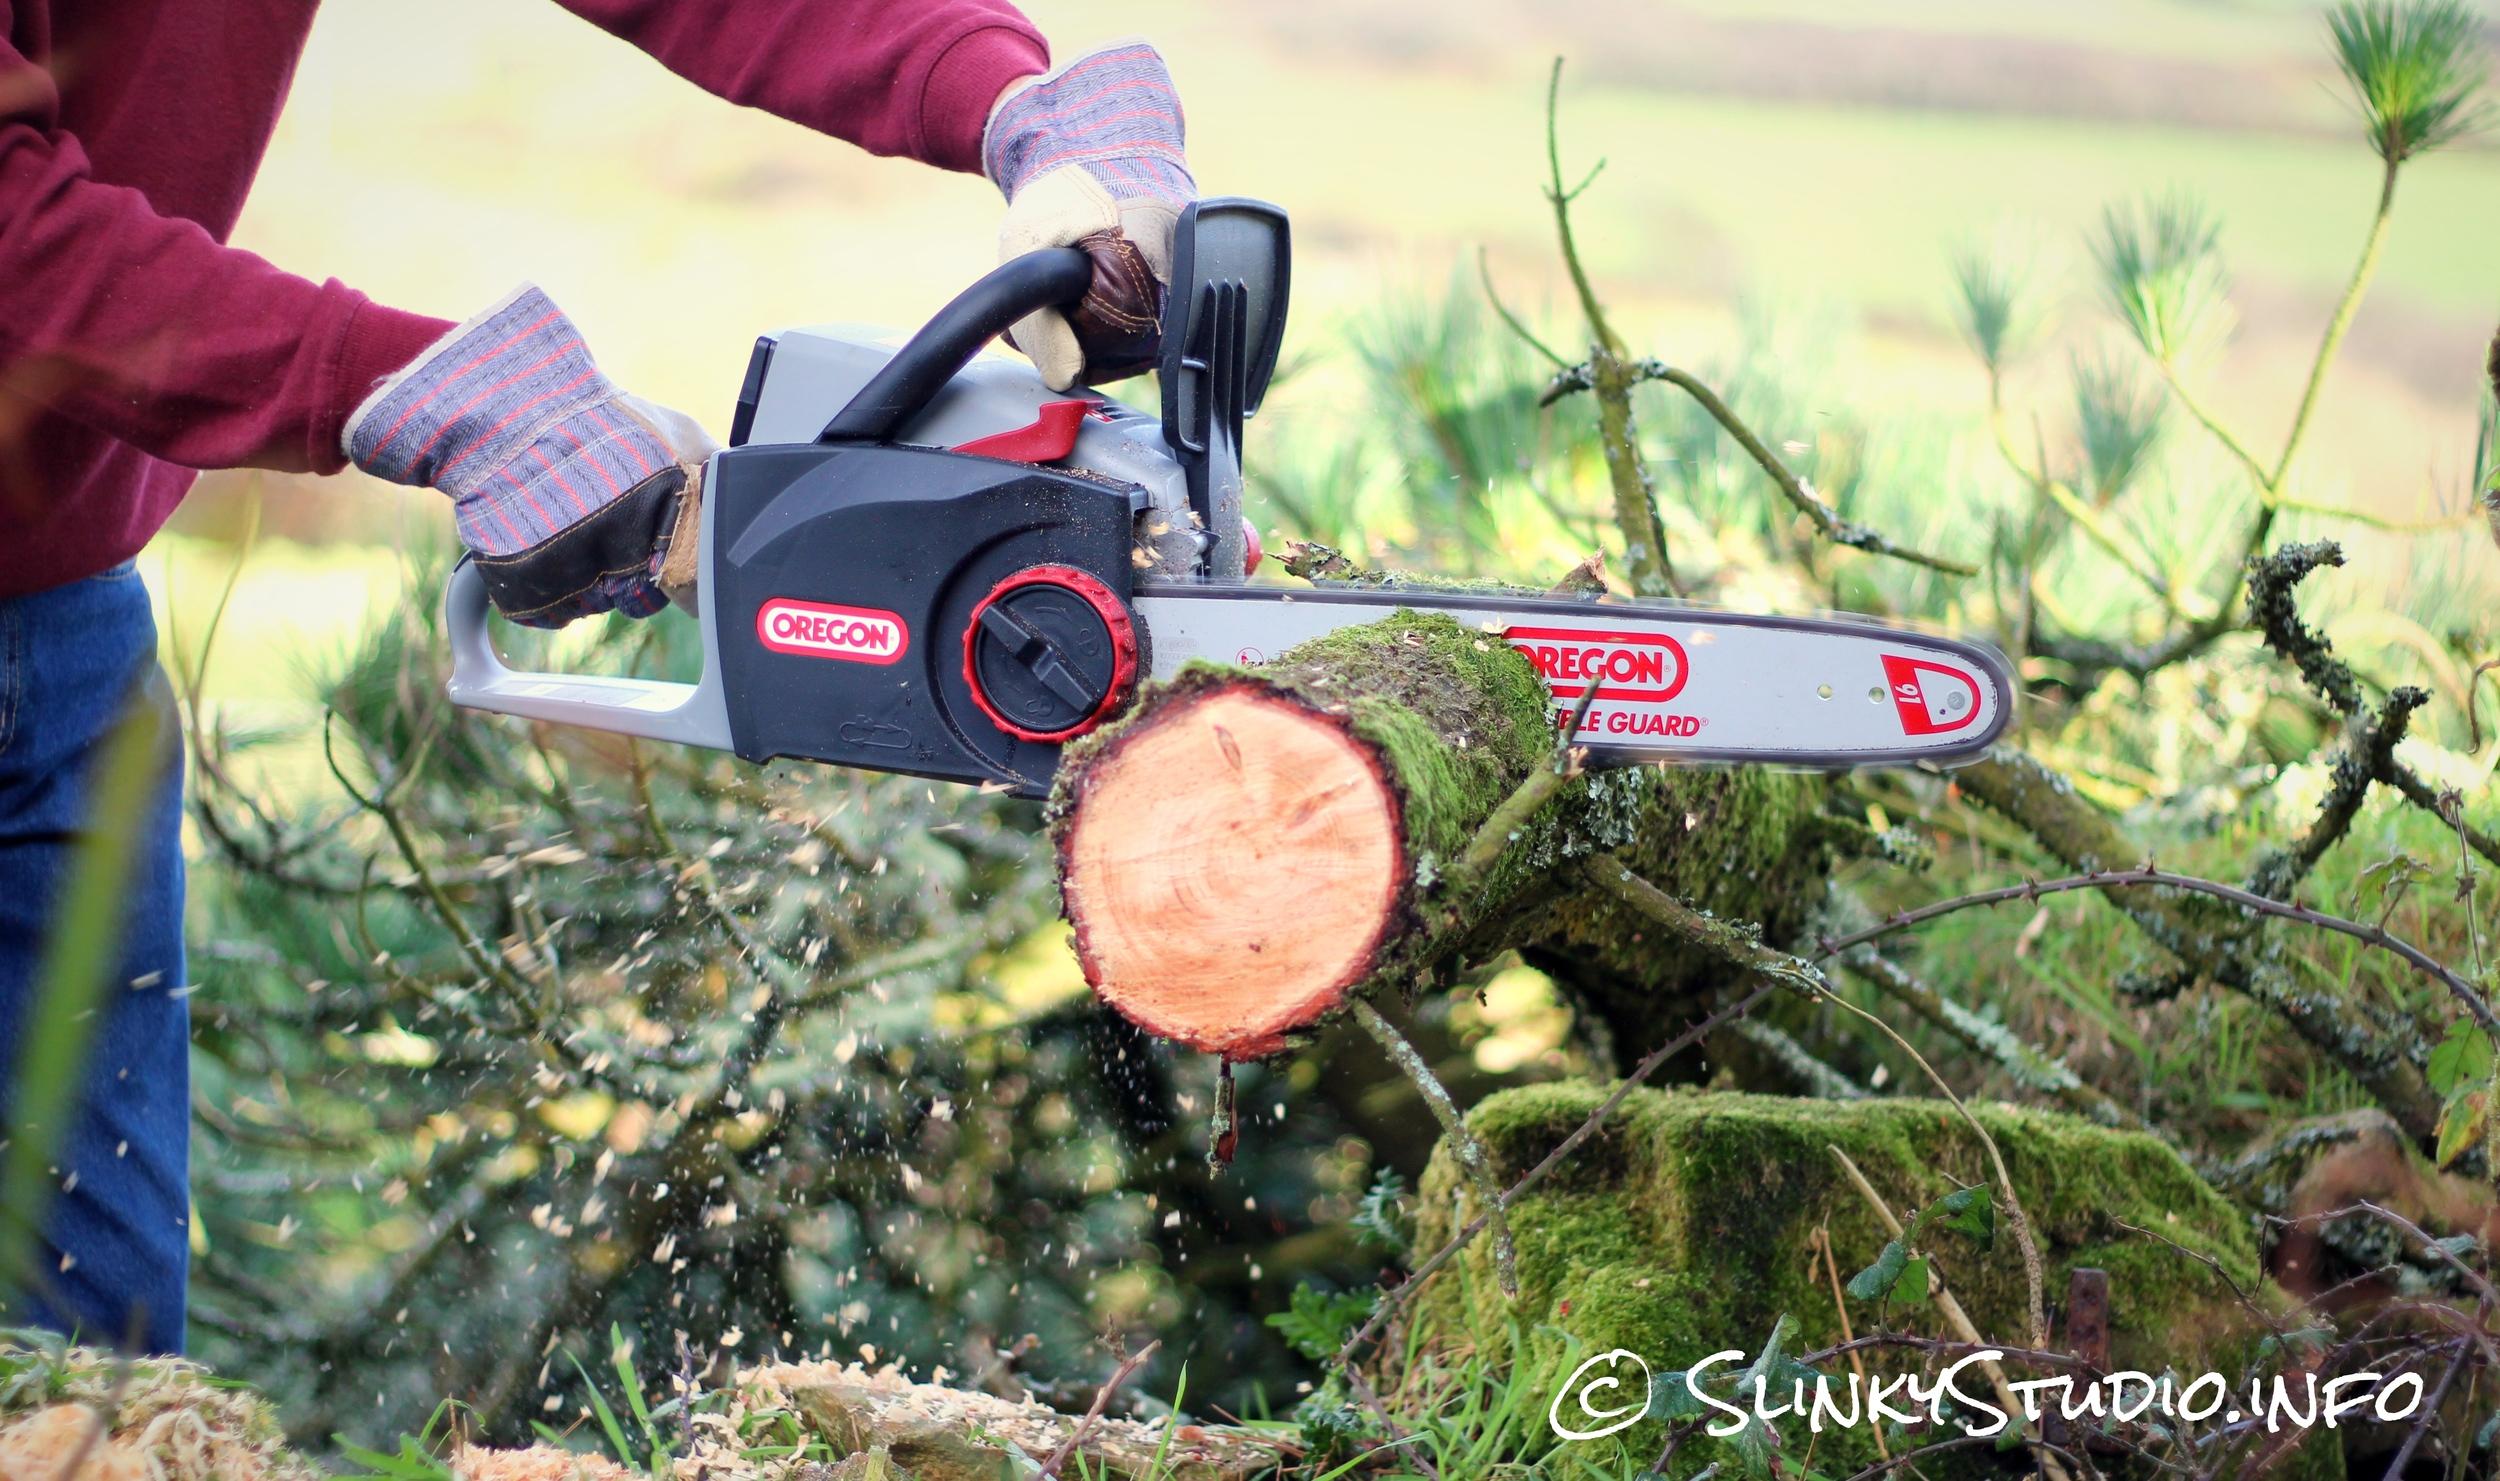 Oregon CS300 PowerNow Cordless Chainsaw Cutting Through Branch Side View Grain.jpg